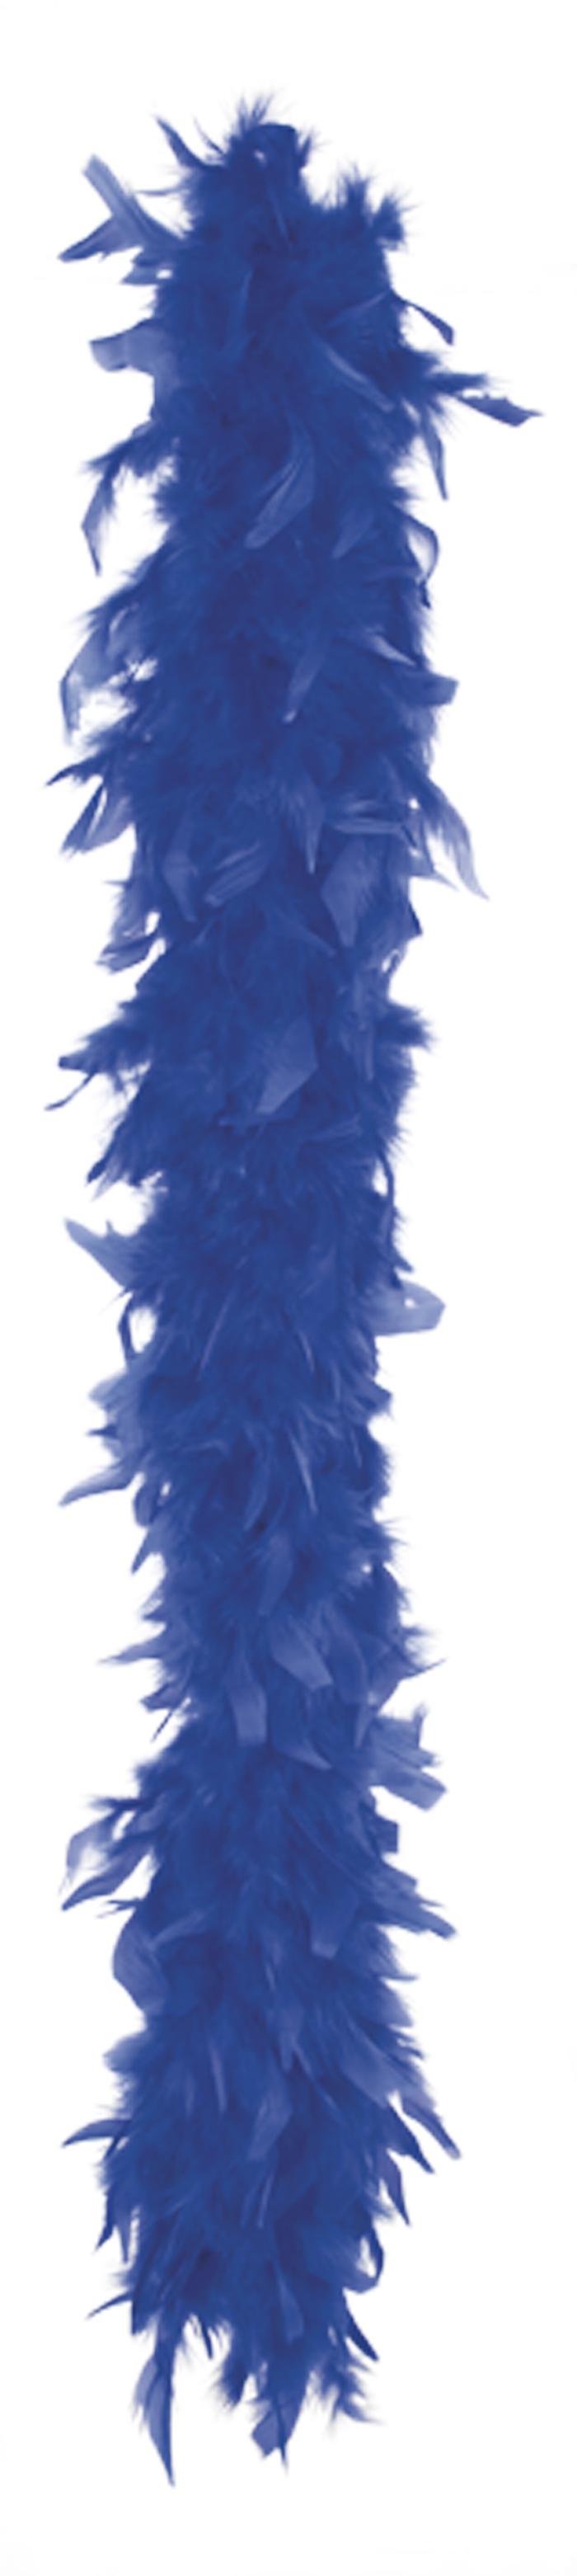 Boa 50 g blauw (180 cm)